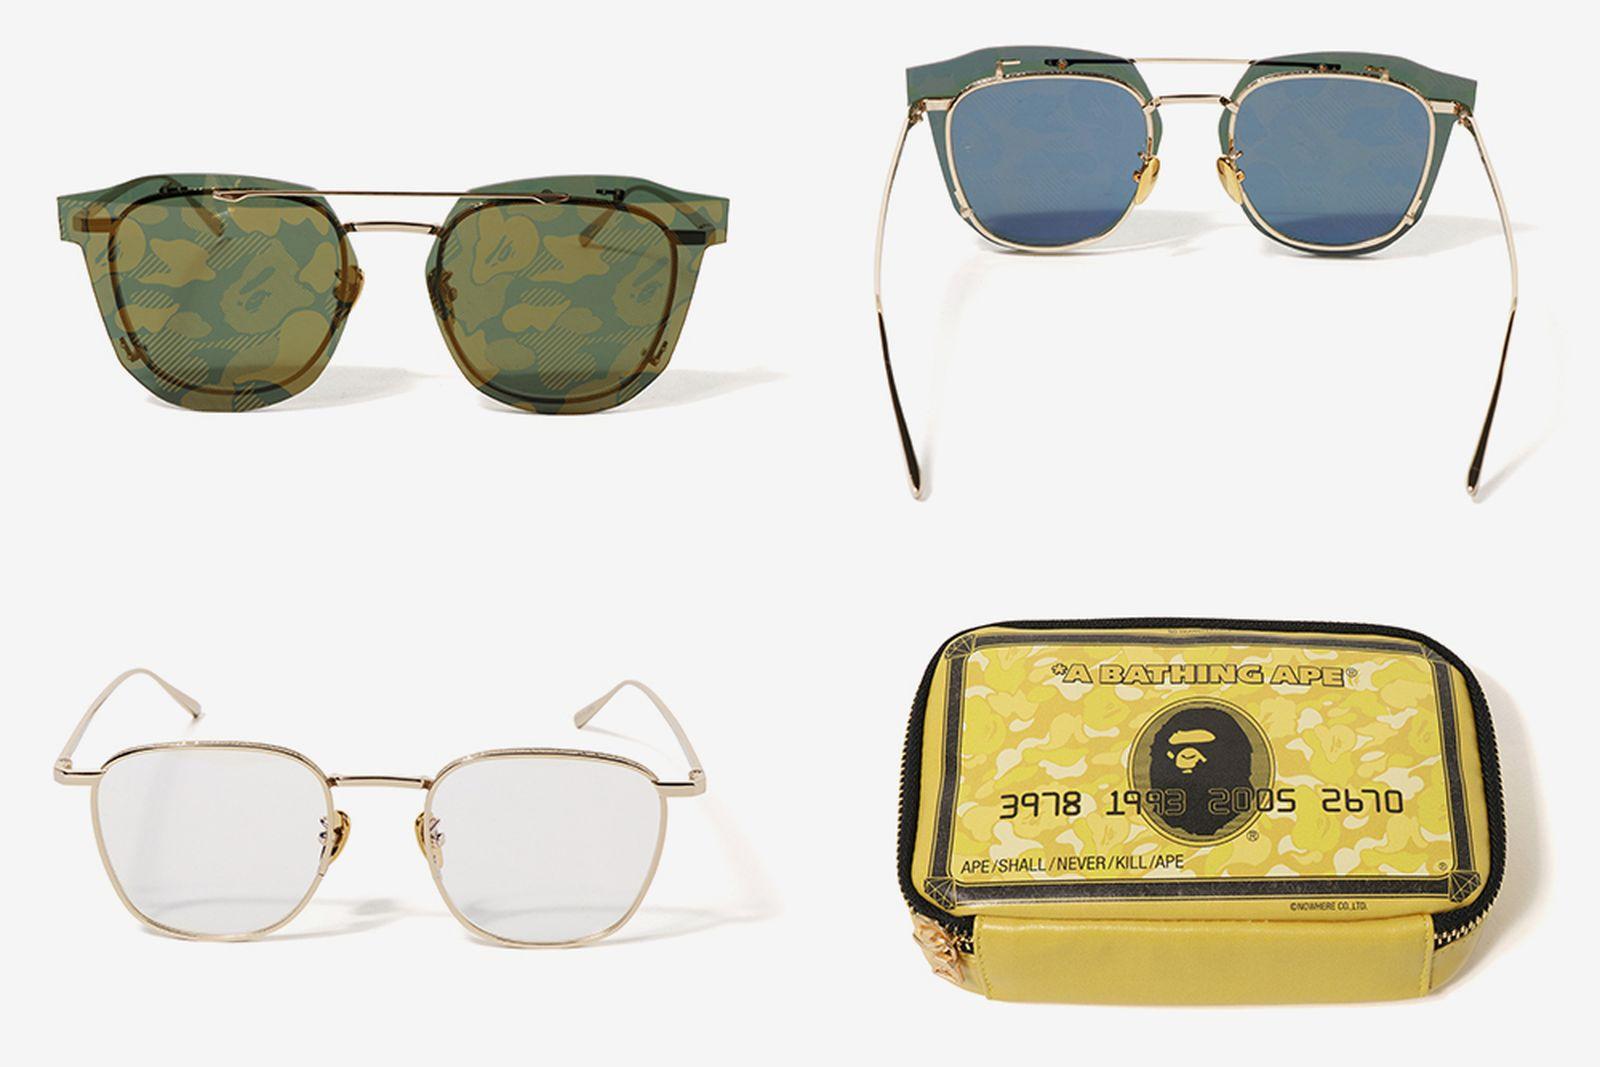 bape sunglasses 2019 A Bathing Ape